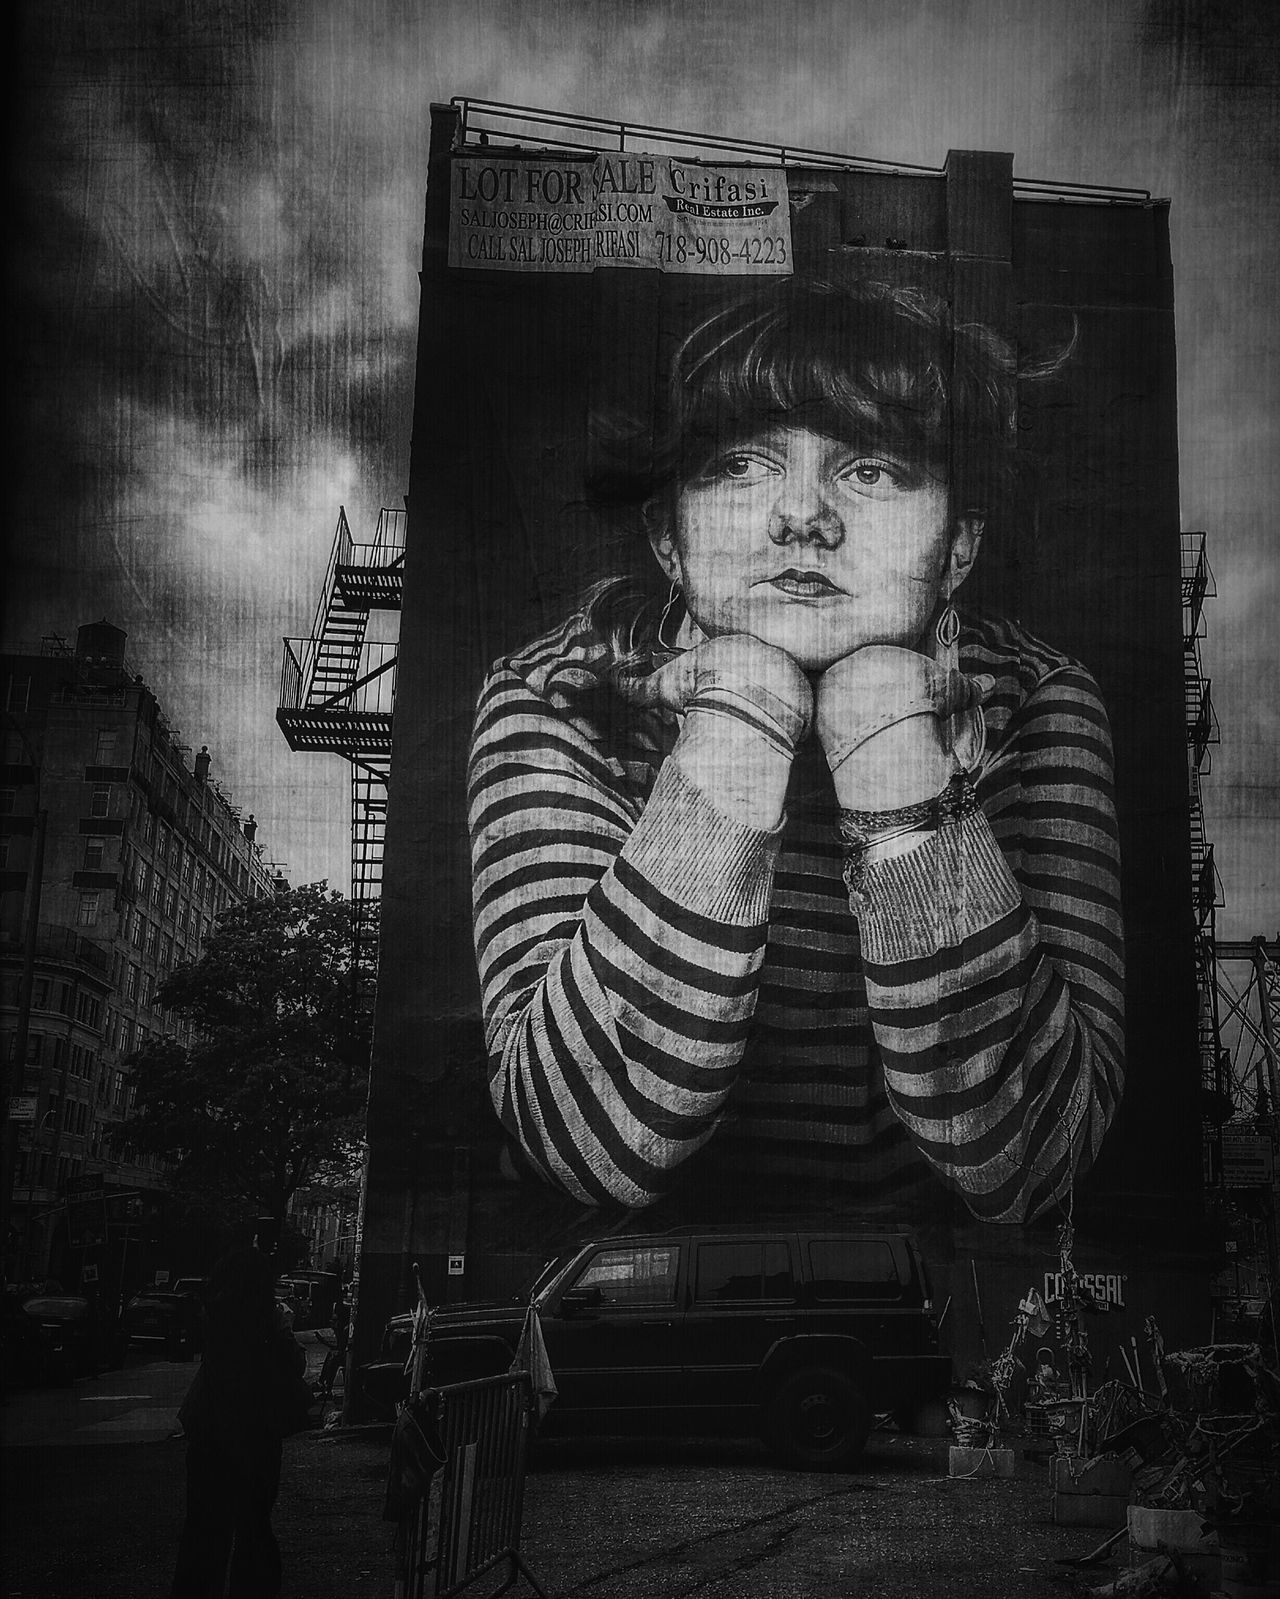 Lost Time,mural of Steven Paul's winning photo in Williamsburg, Brooklyn Monochrome Photography IPhoneography Youmobile AMPt_community Shootermag EyeEm Gallery The Week On Eyem The Week Of Eyeem Everybodystreet Streetphotography Street Blackandwhite Monochrome Eye4photography  IMography Williamsburg